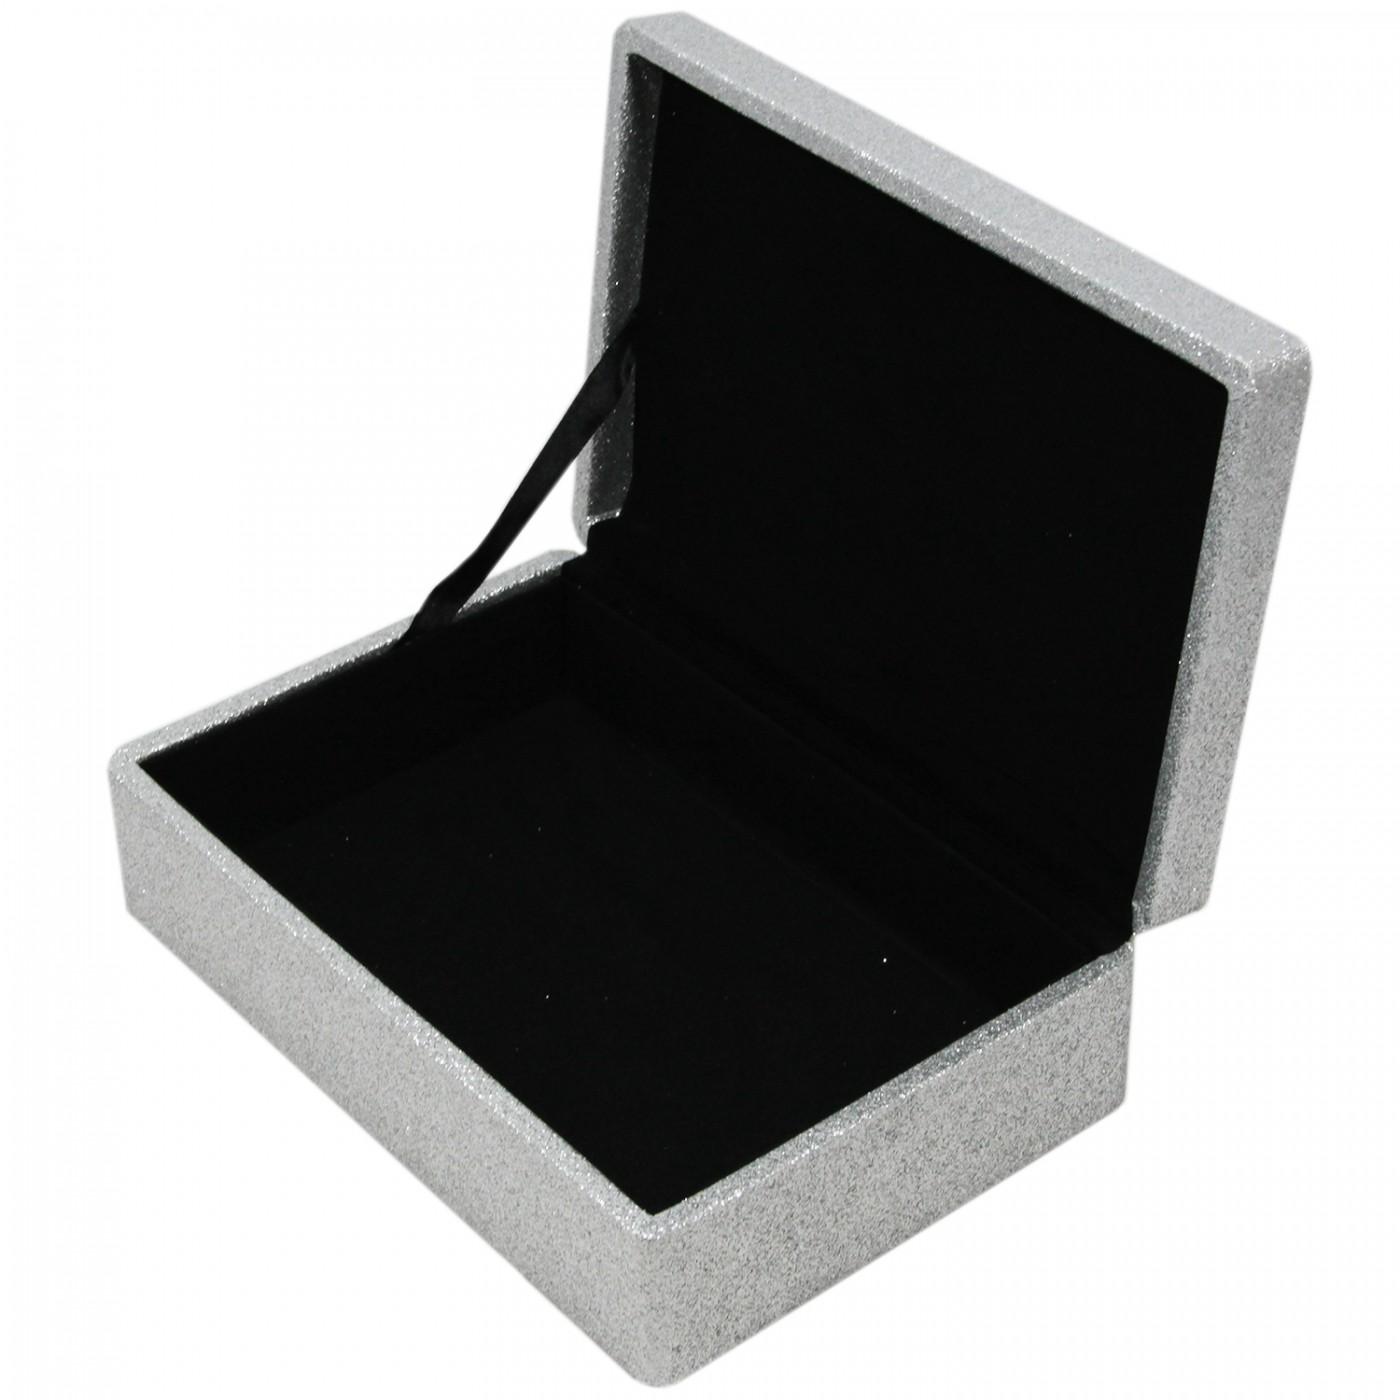 Szkatułka pudełko na prezent drobiazgi brokatowa szara